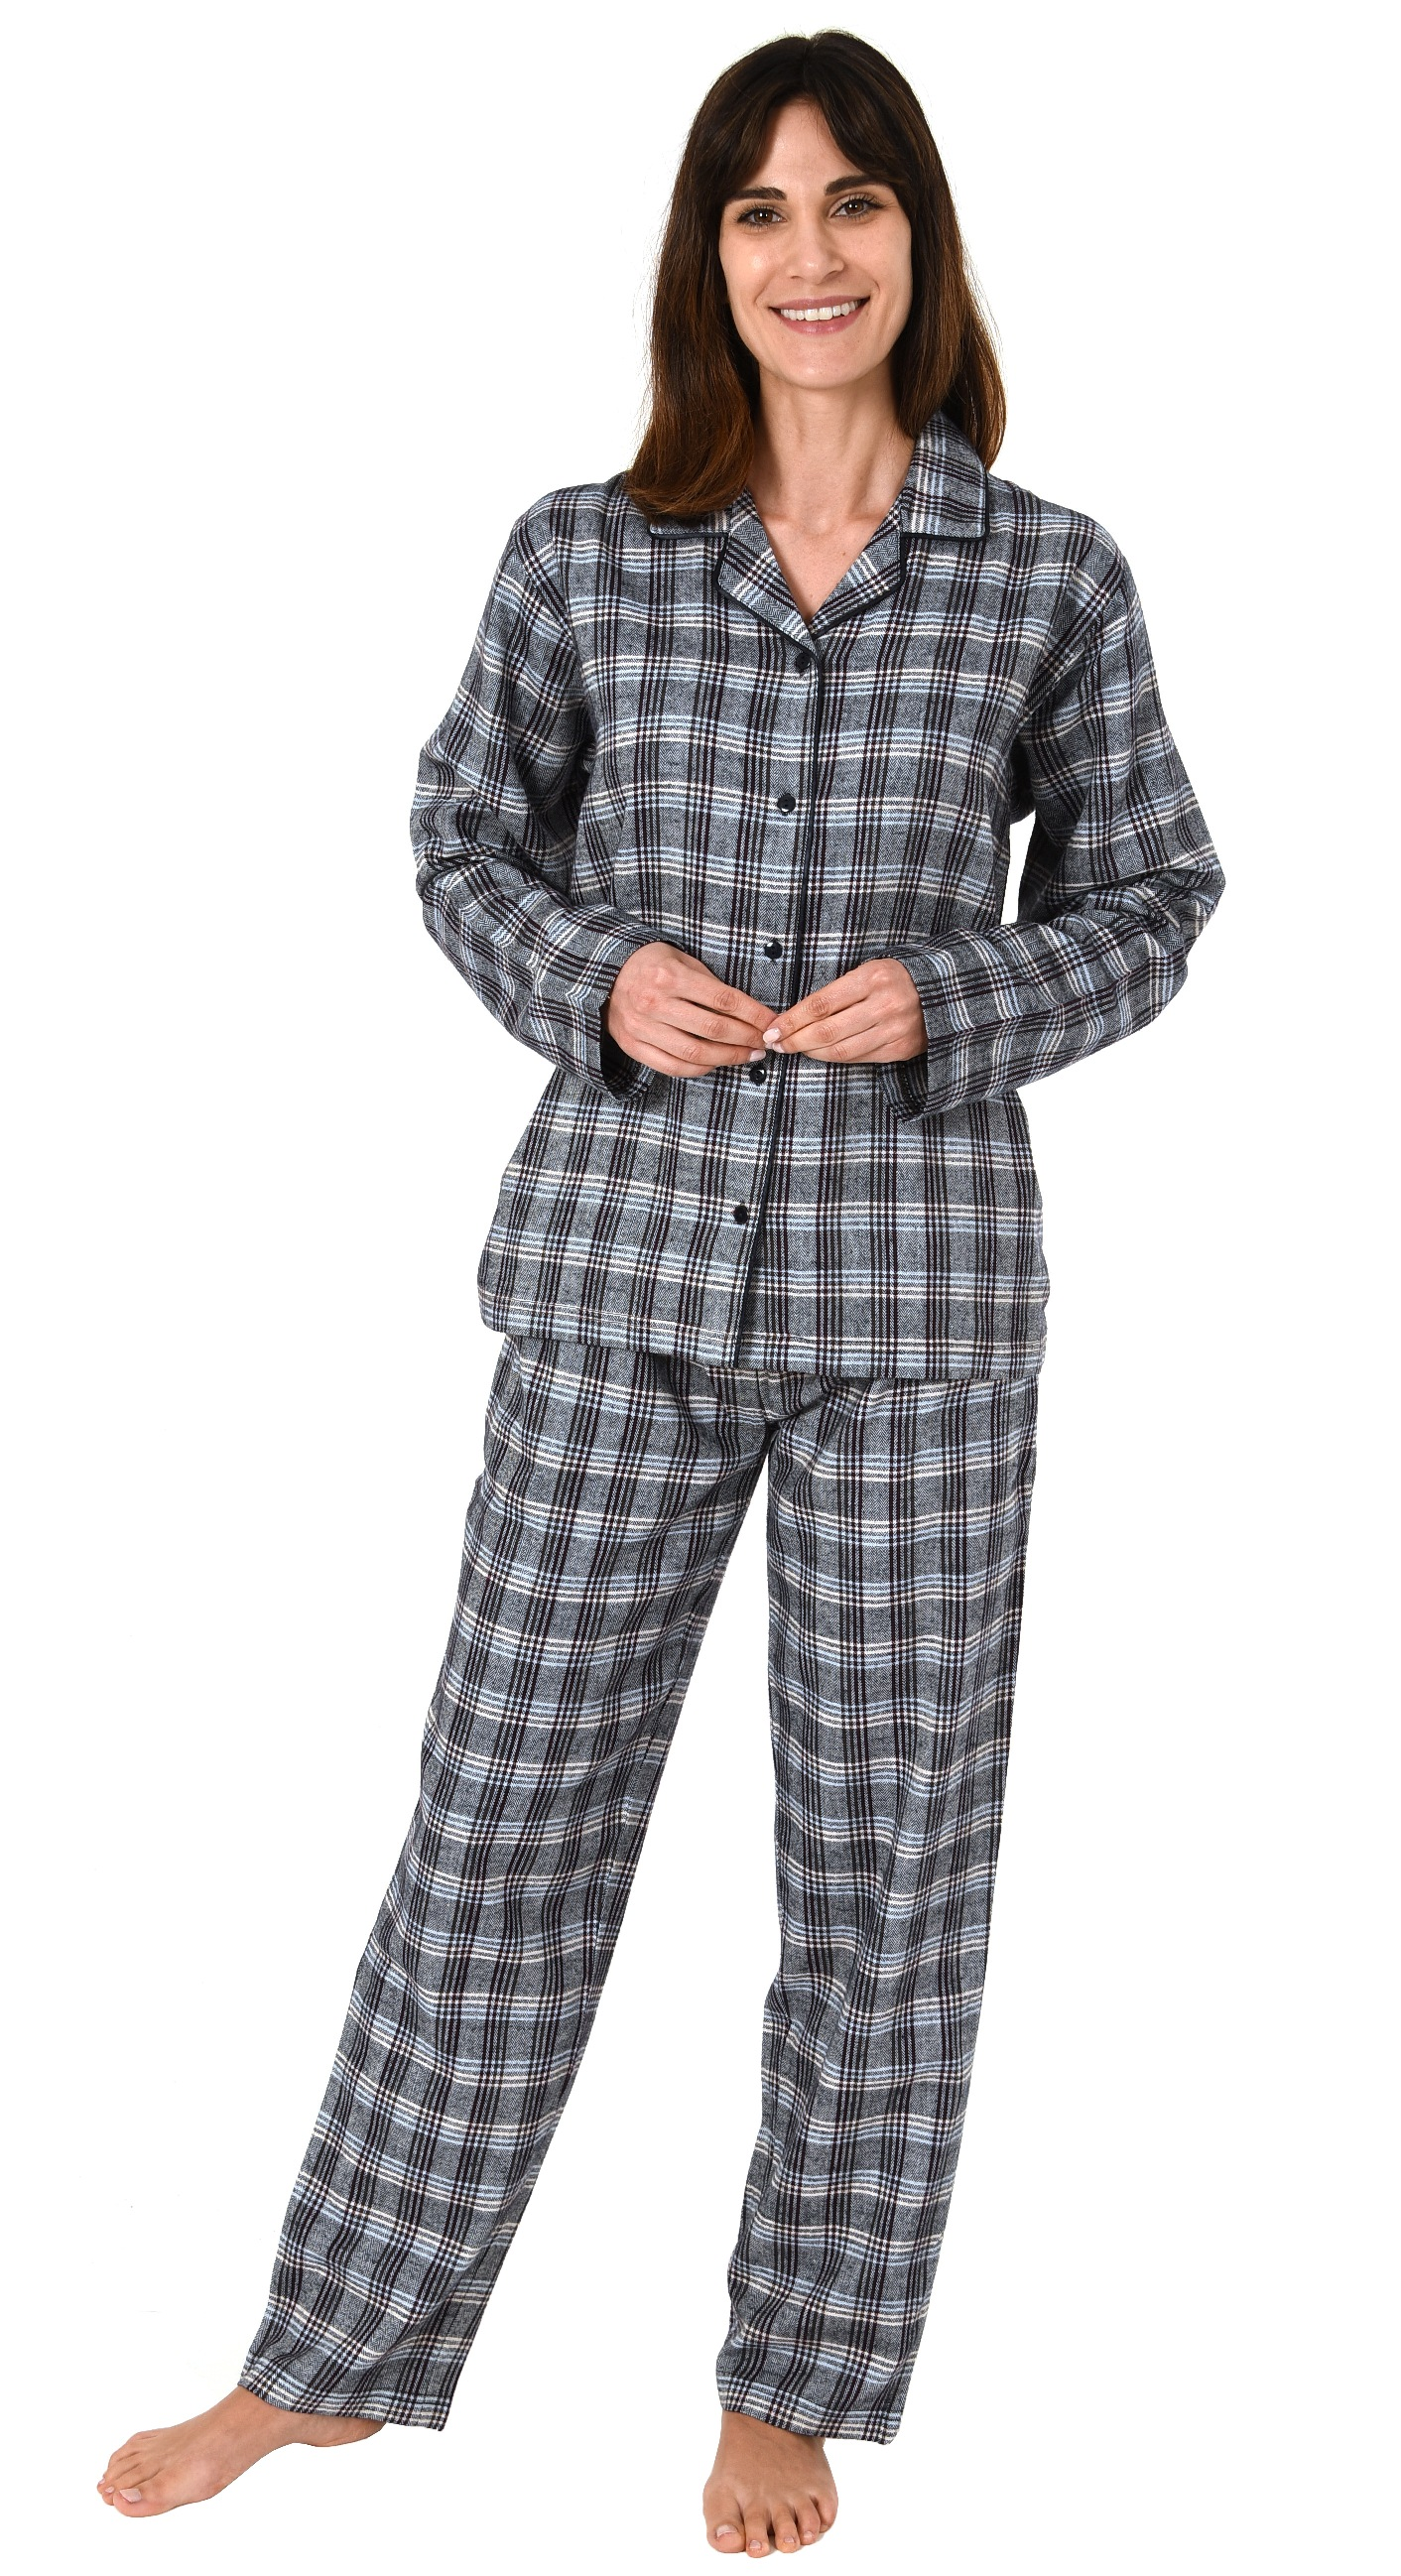 buy popular 4c2b4 d375e Damen Flanell Pyjama Schlafanzug langarm kariert – auch in Übergrößen 281  201 95 991